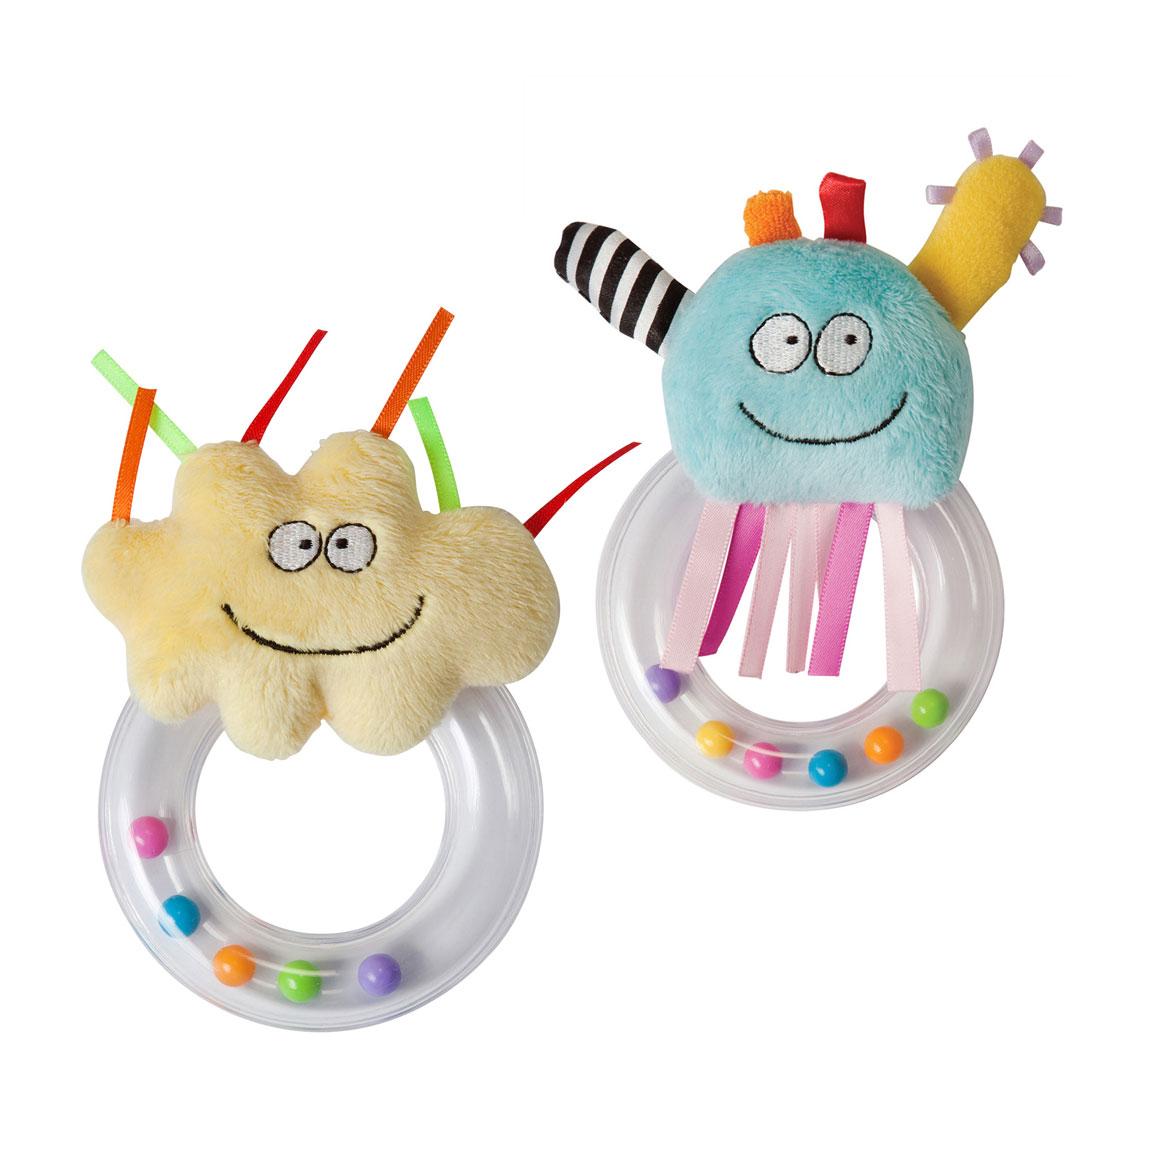 ���������� Taf Toys � ������������ (11155)